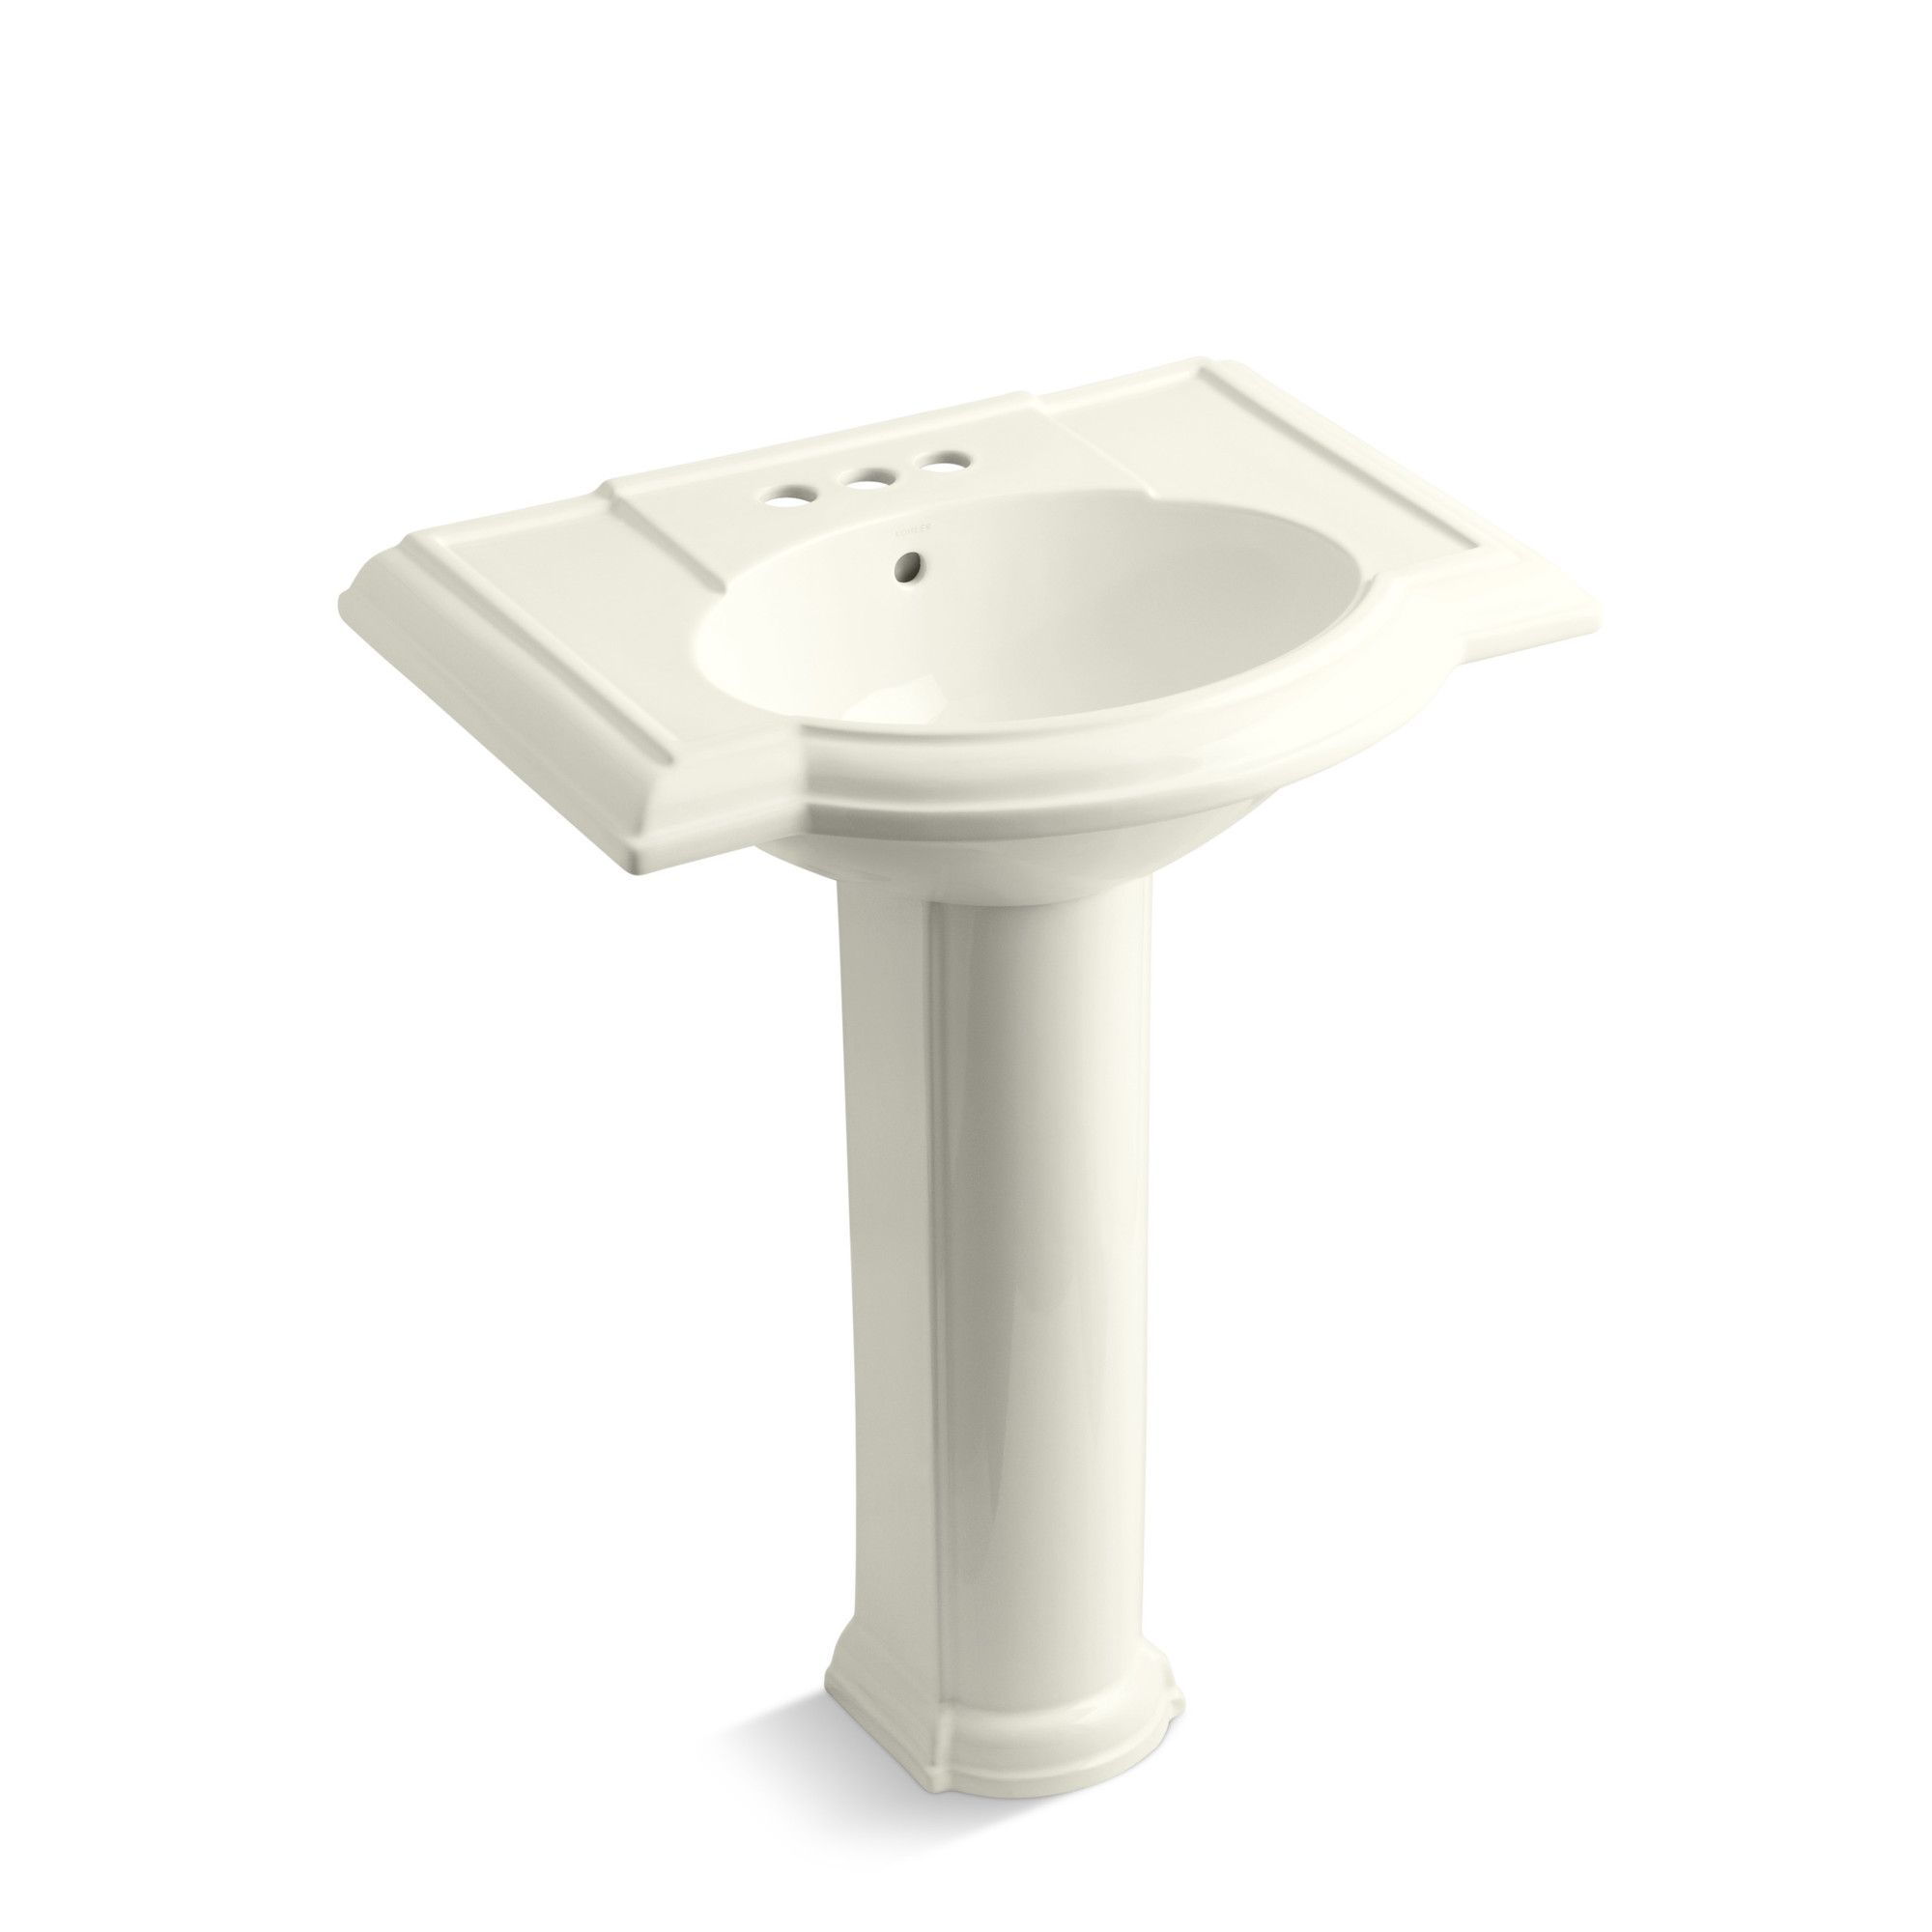 Devonshire 27 Pedestal Bathroom Sink With 4 Centerset Faucet